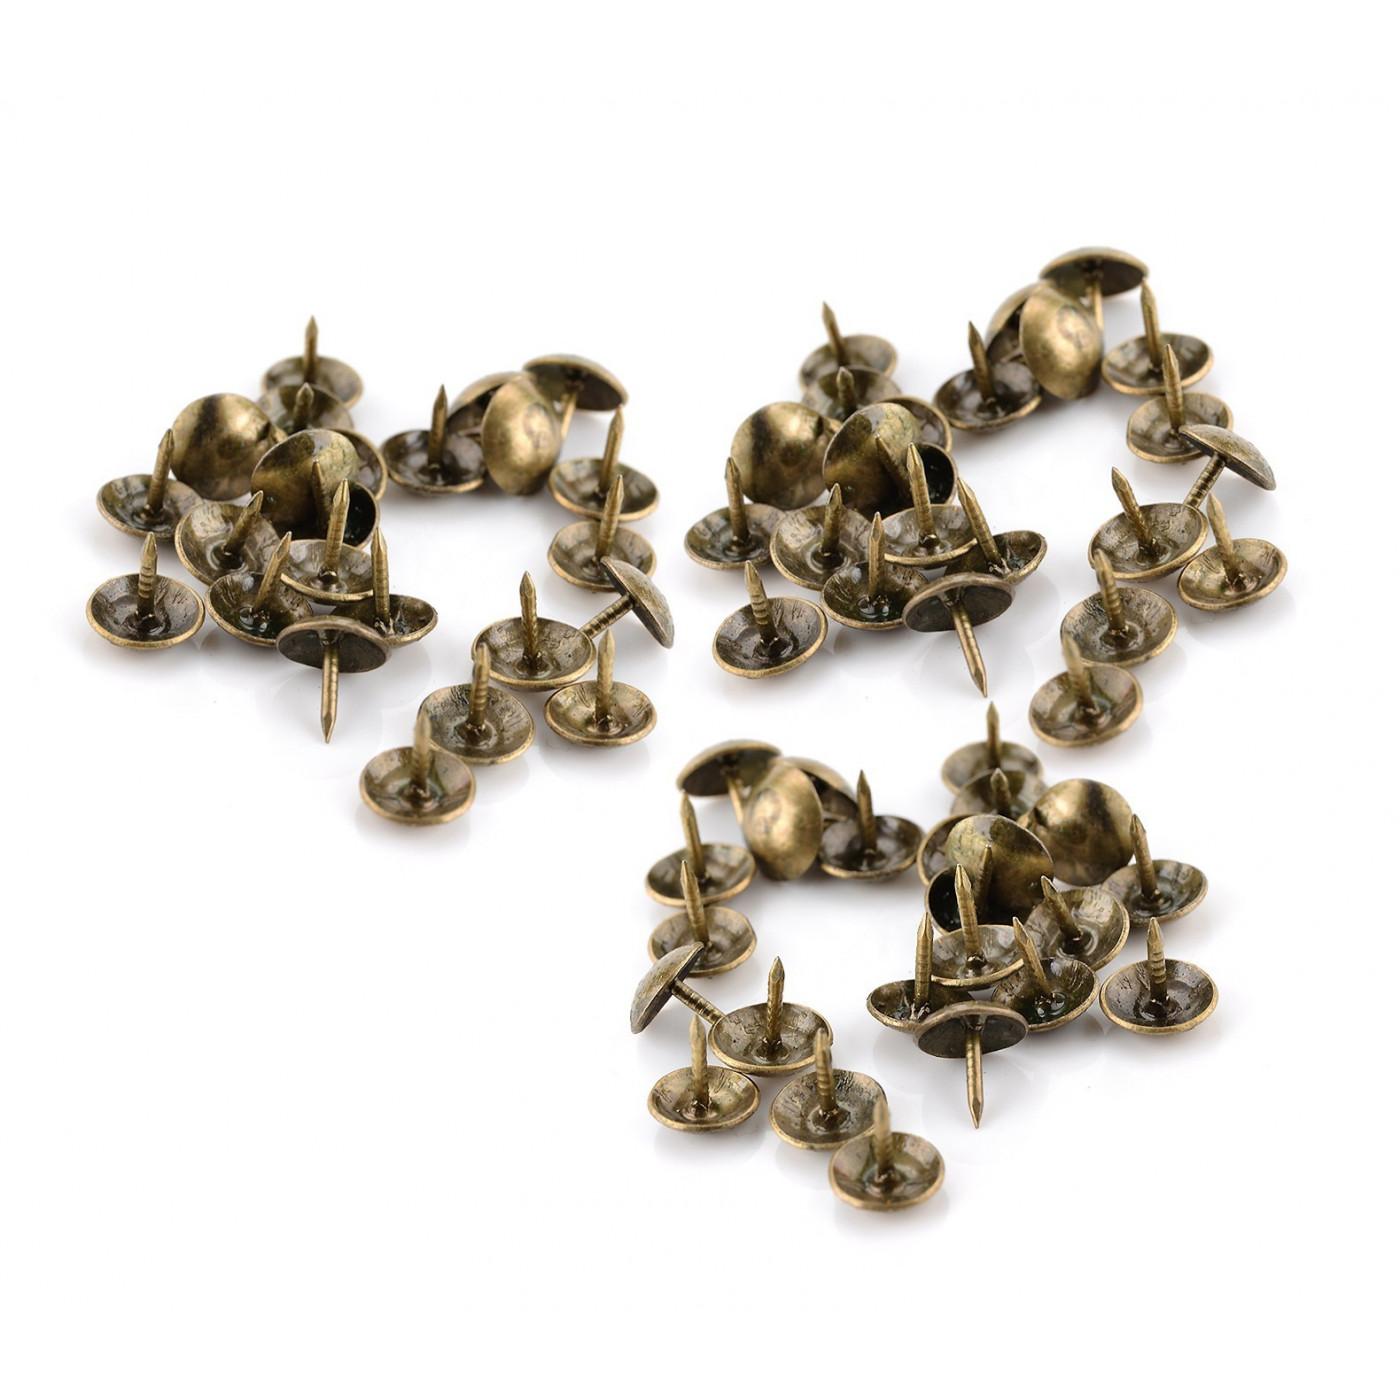 Set of 100 furniture nails (push pins, 9x10 mm, bronze, type 3)